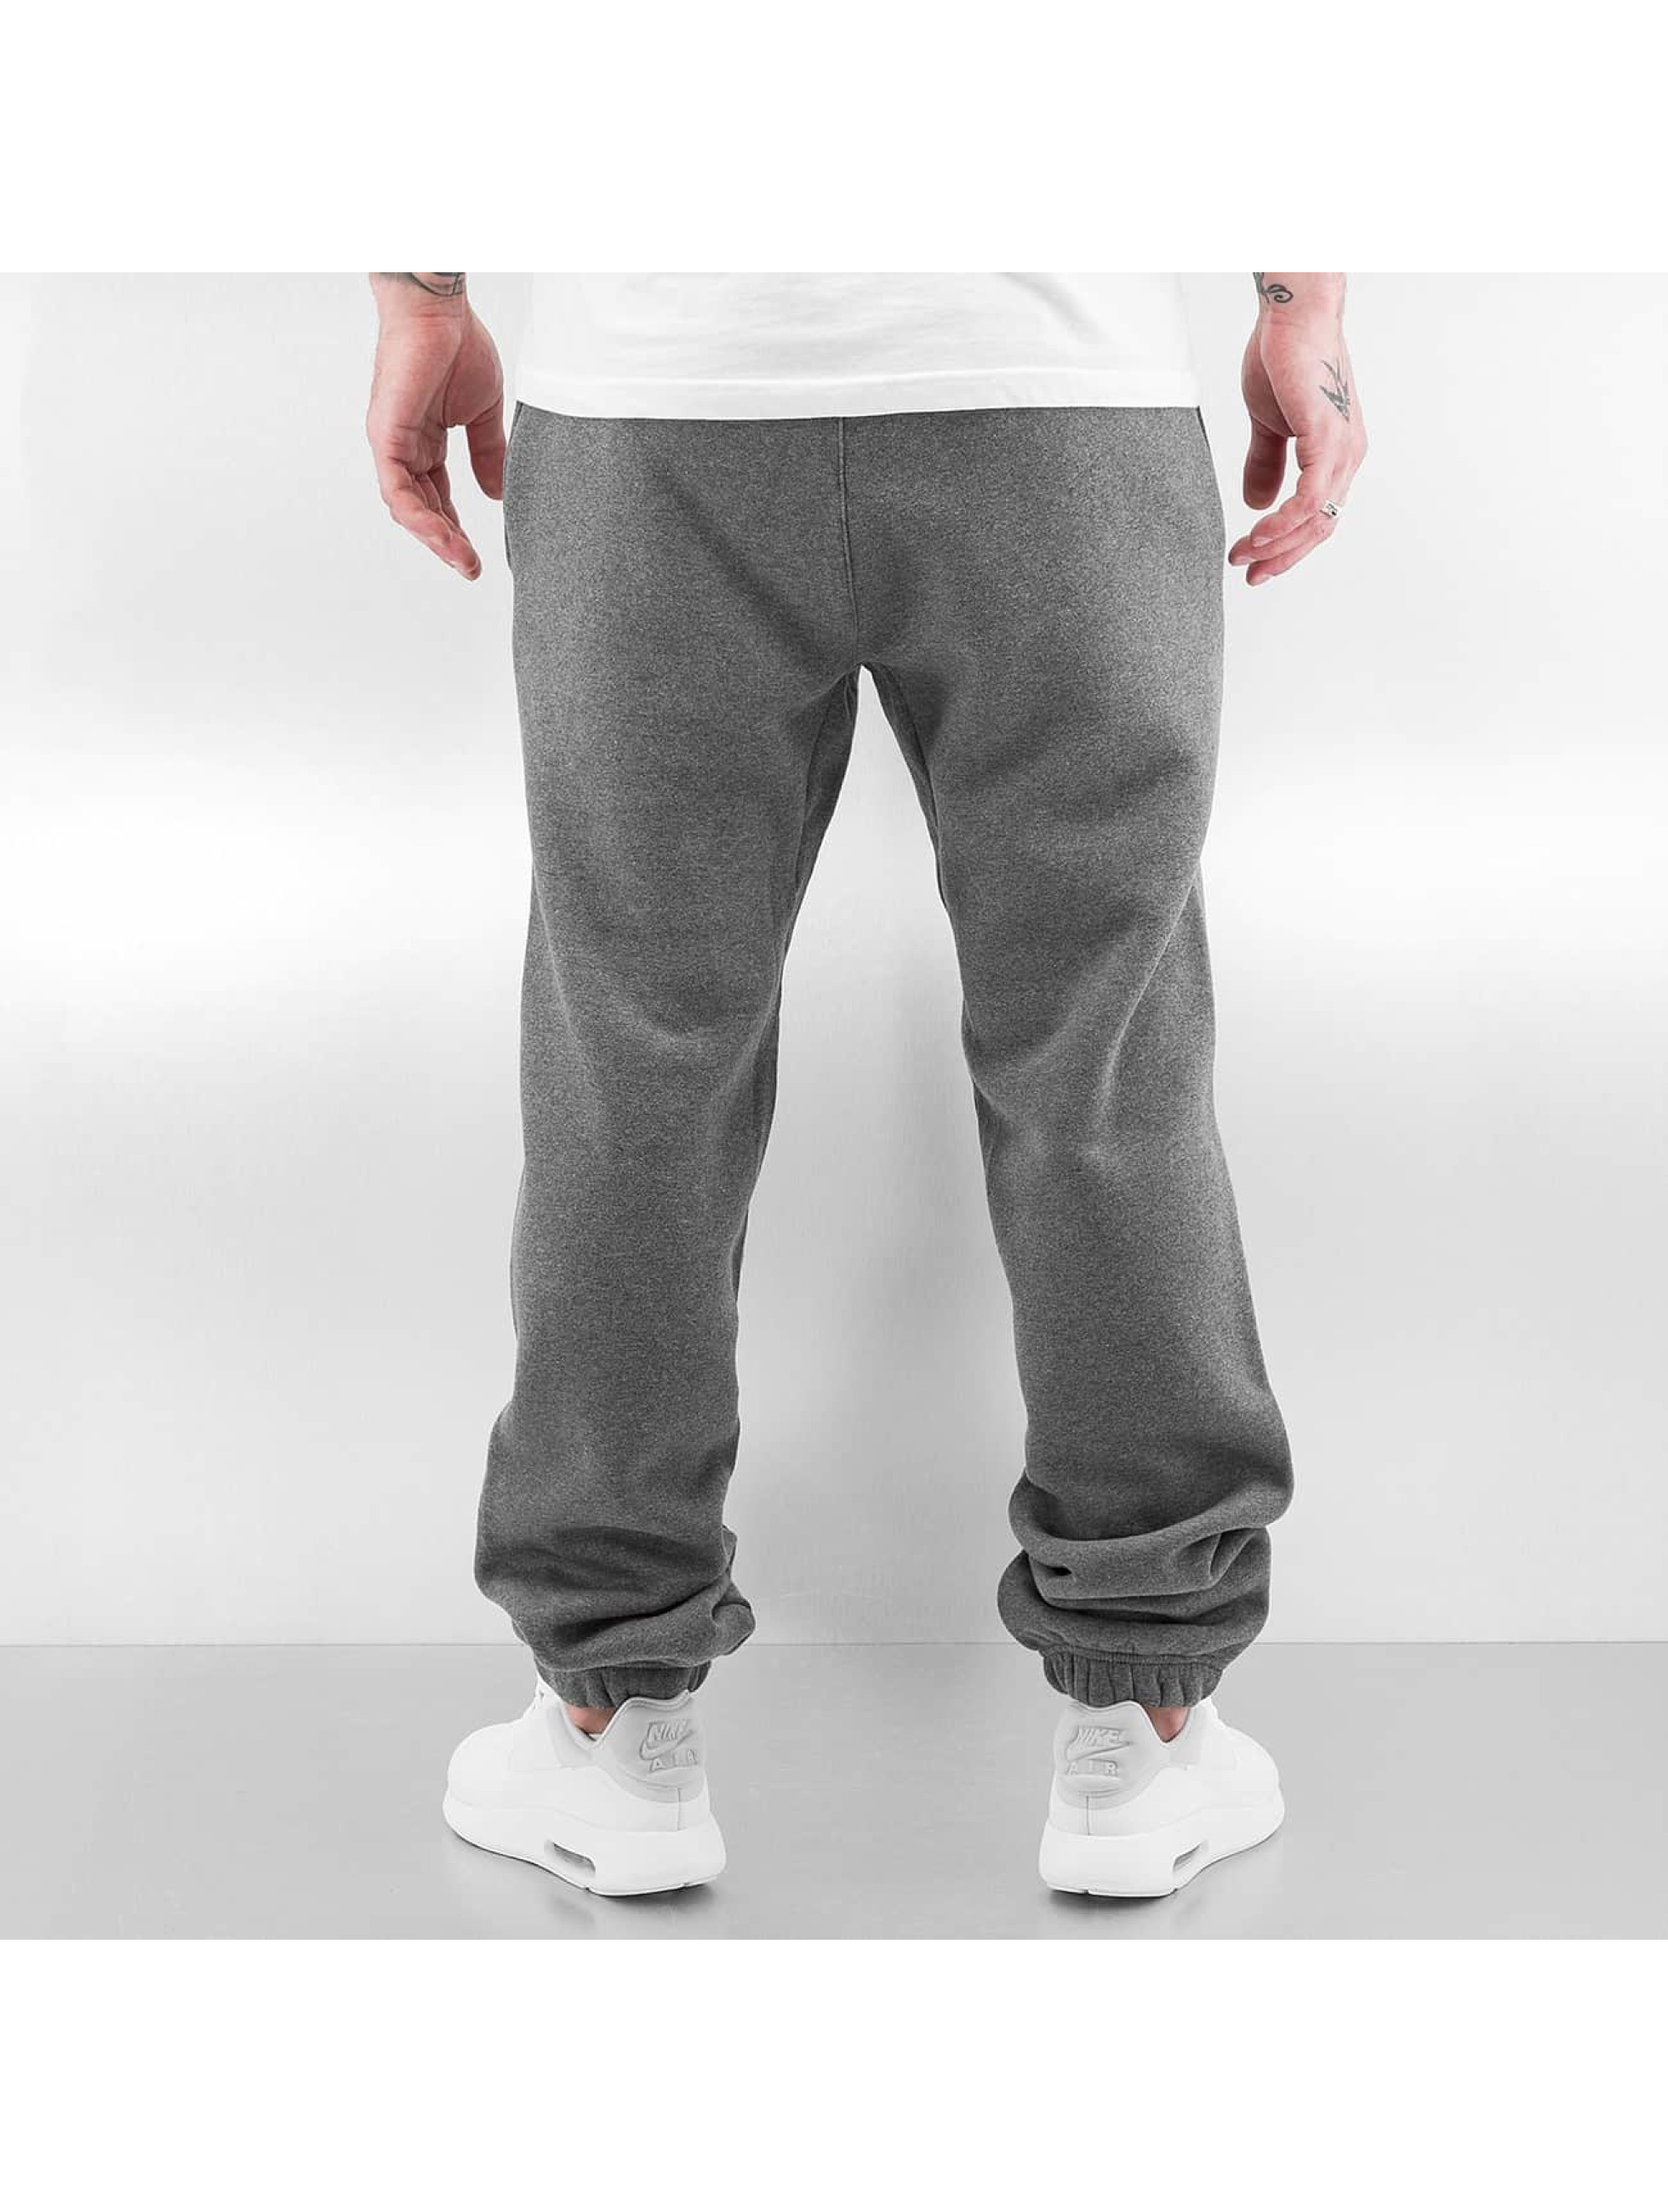 nike nsw cf flc club gris homme jogging nike acheter pas cher pantalon 257526. Black Bedroom Furniture Sets. Home Design Ideas